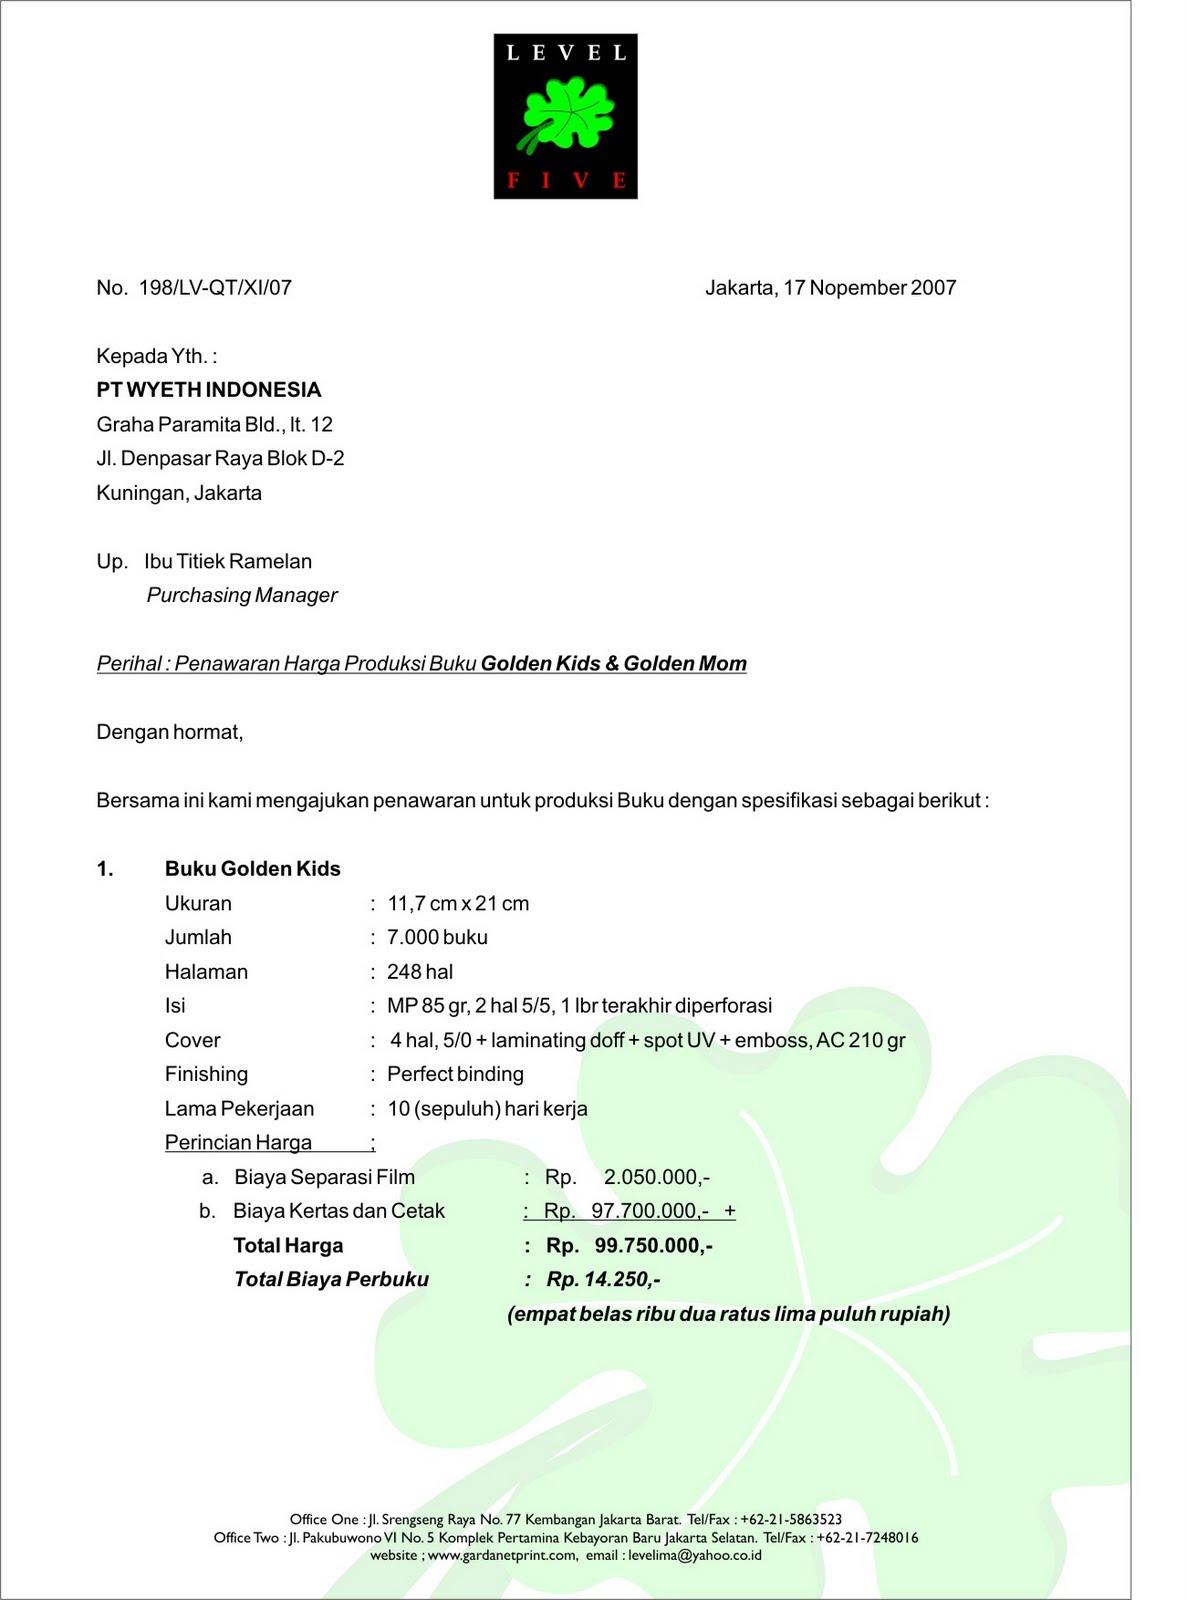 Contoh surat penawaran harga hotel surat 25 contoh surat penawaran contoh surat penawaran bisnis page altavistaventures Gallery